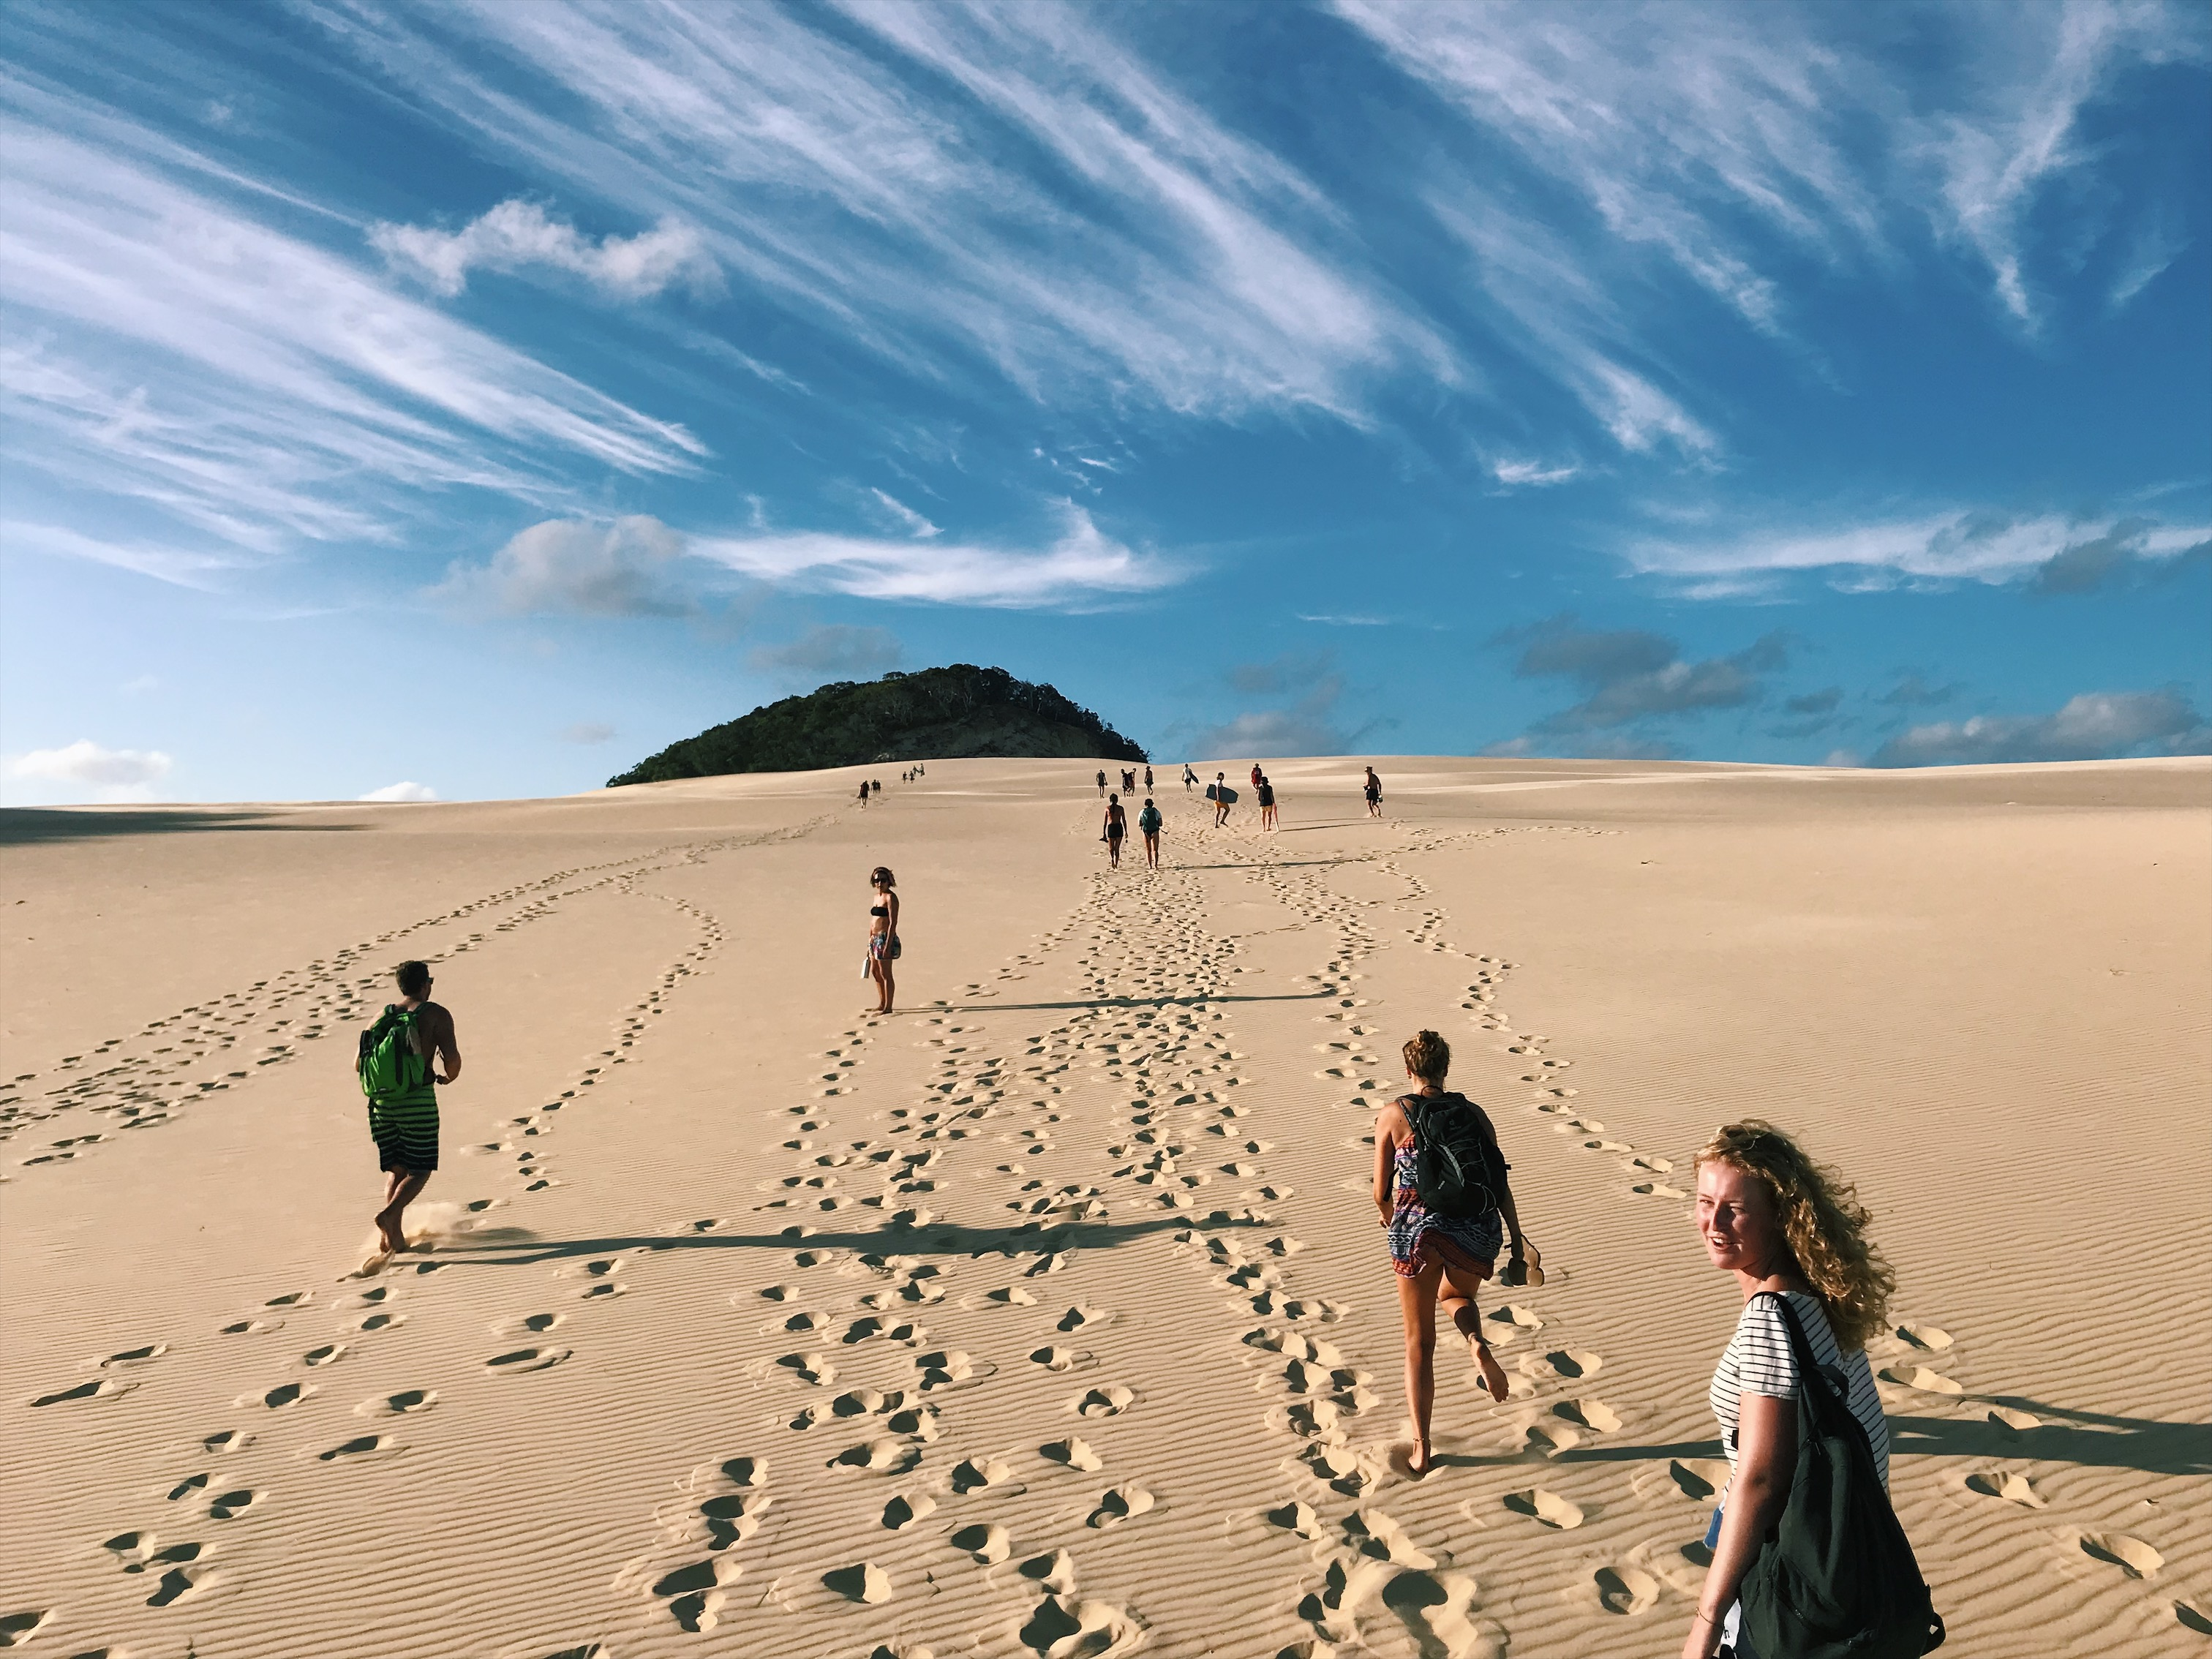 east coast Australia 20 something travel guide